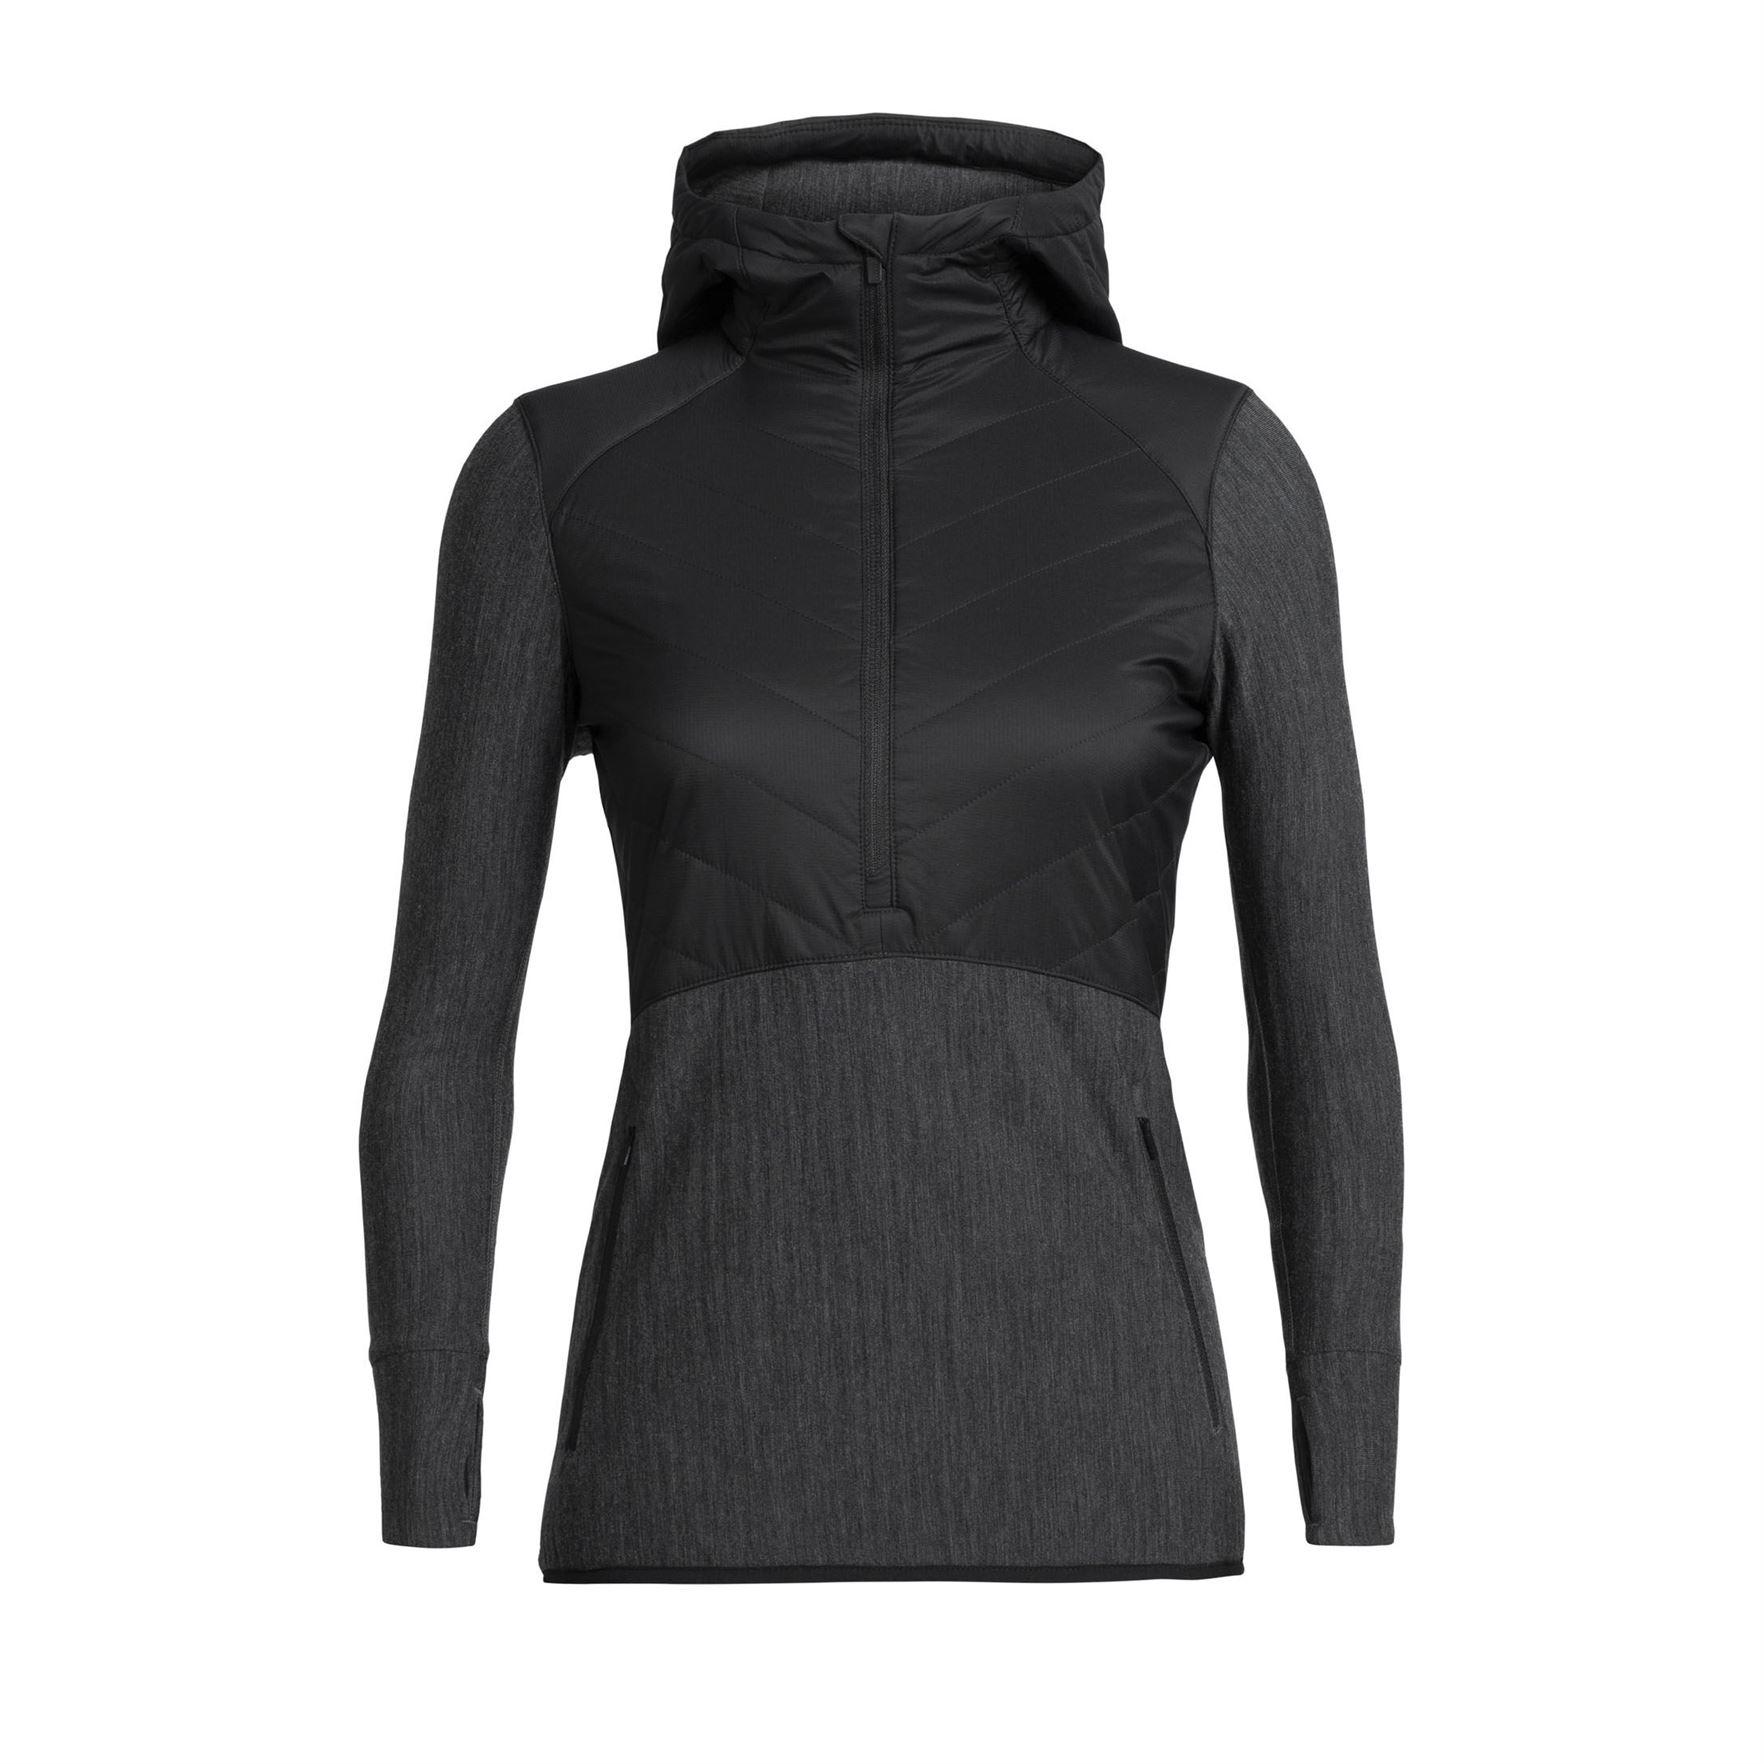 Descender Hybrid Half Zip Hood Long Sleeve - Women's